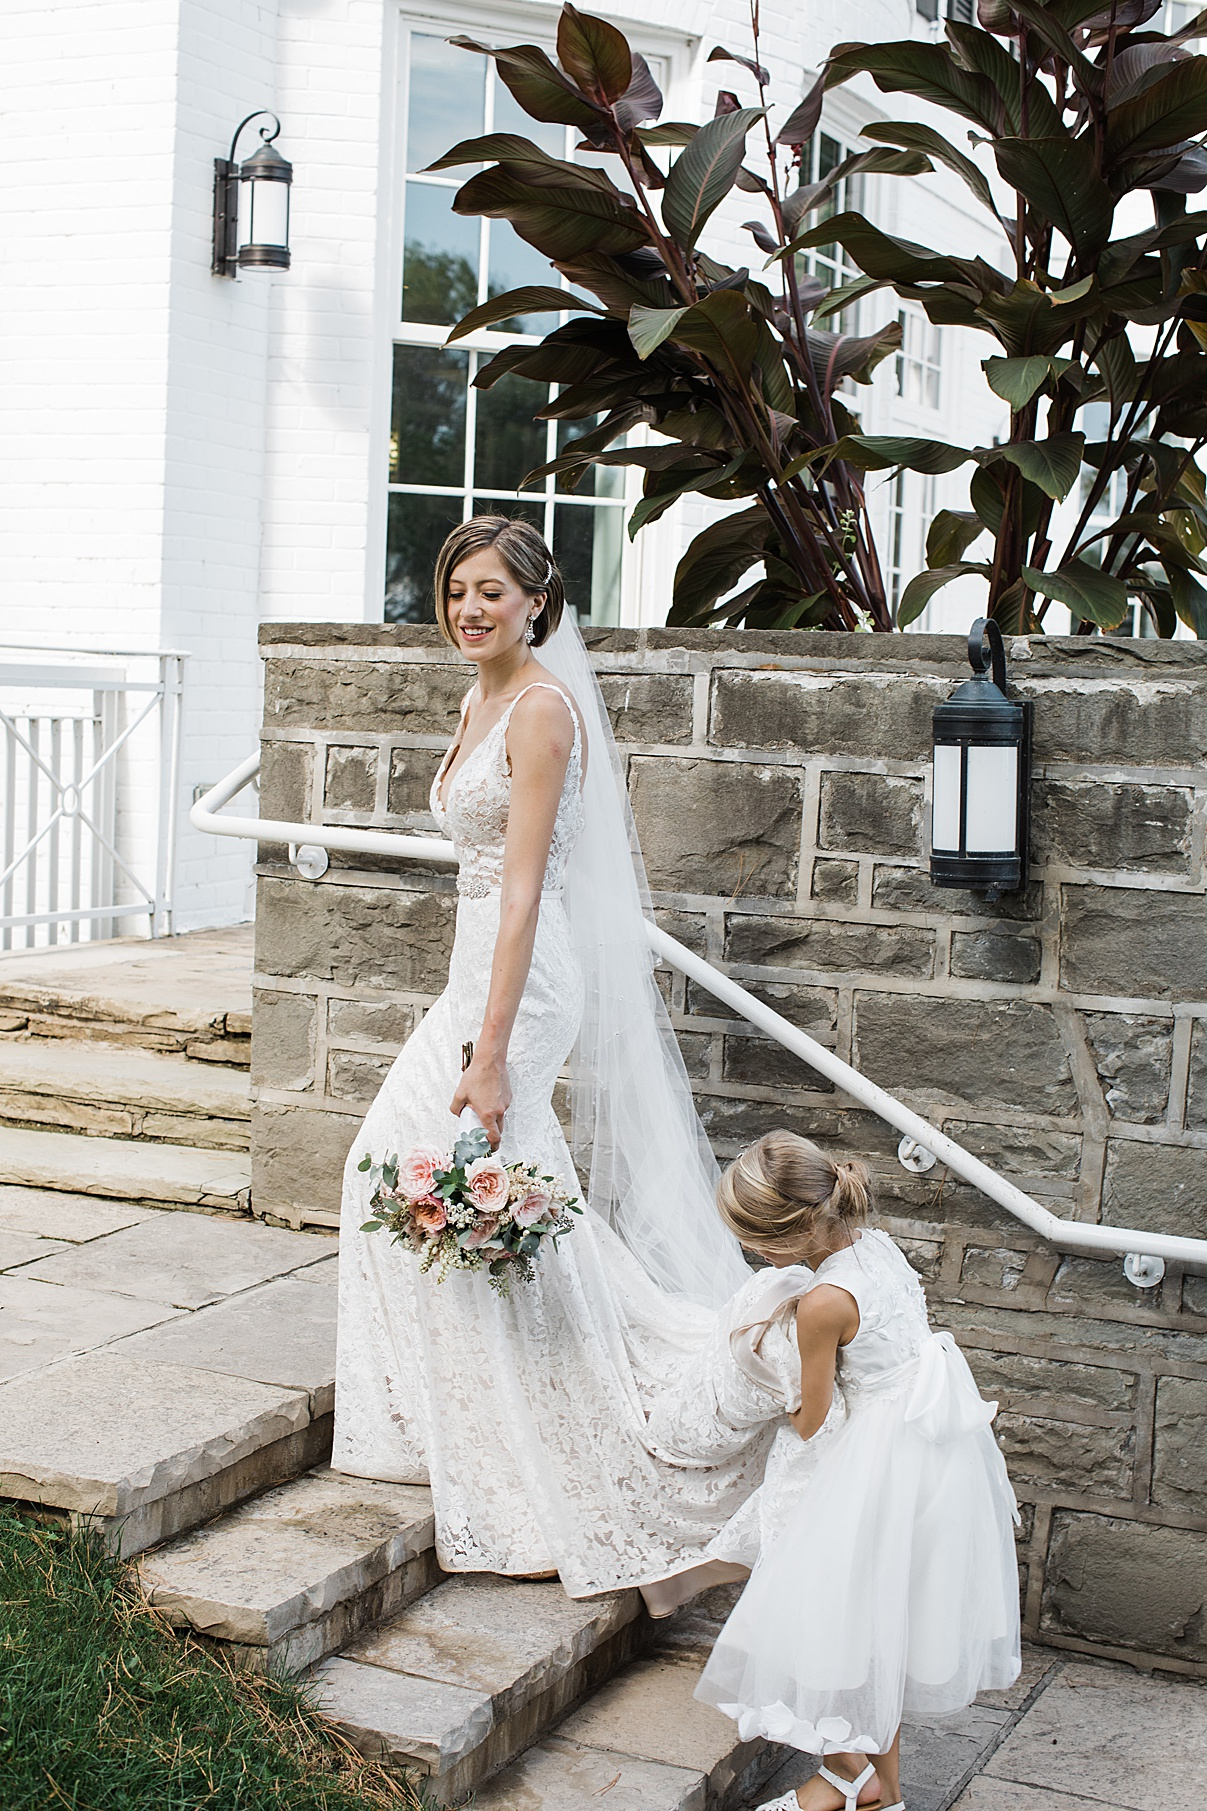 Bride walks up steps with flower girl holding her train| Harding Waterfront Estate Wedding| Ontario wedding photographer| Toronto wedding photographer| 3 Photography | 3photography.ca